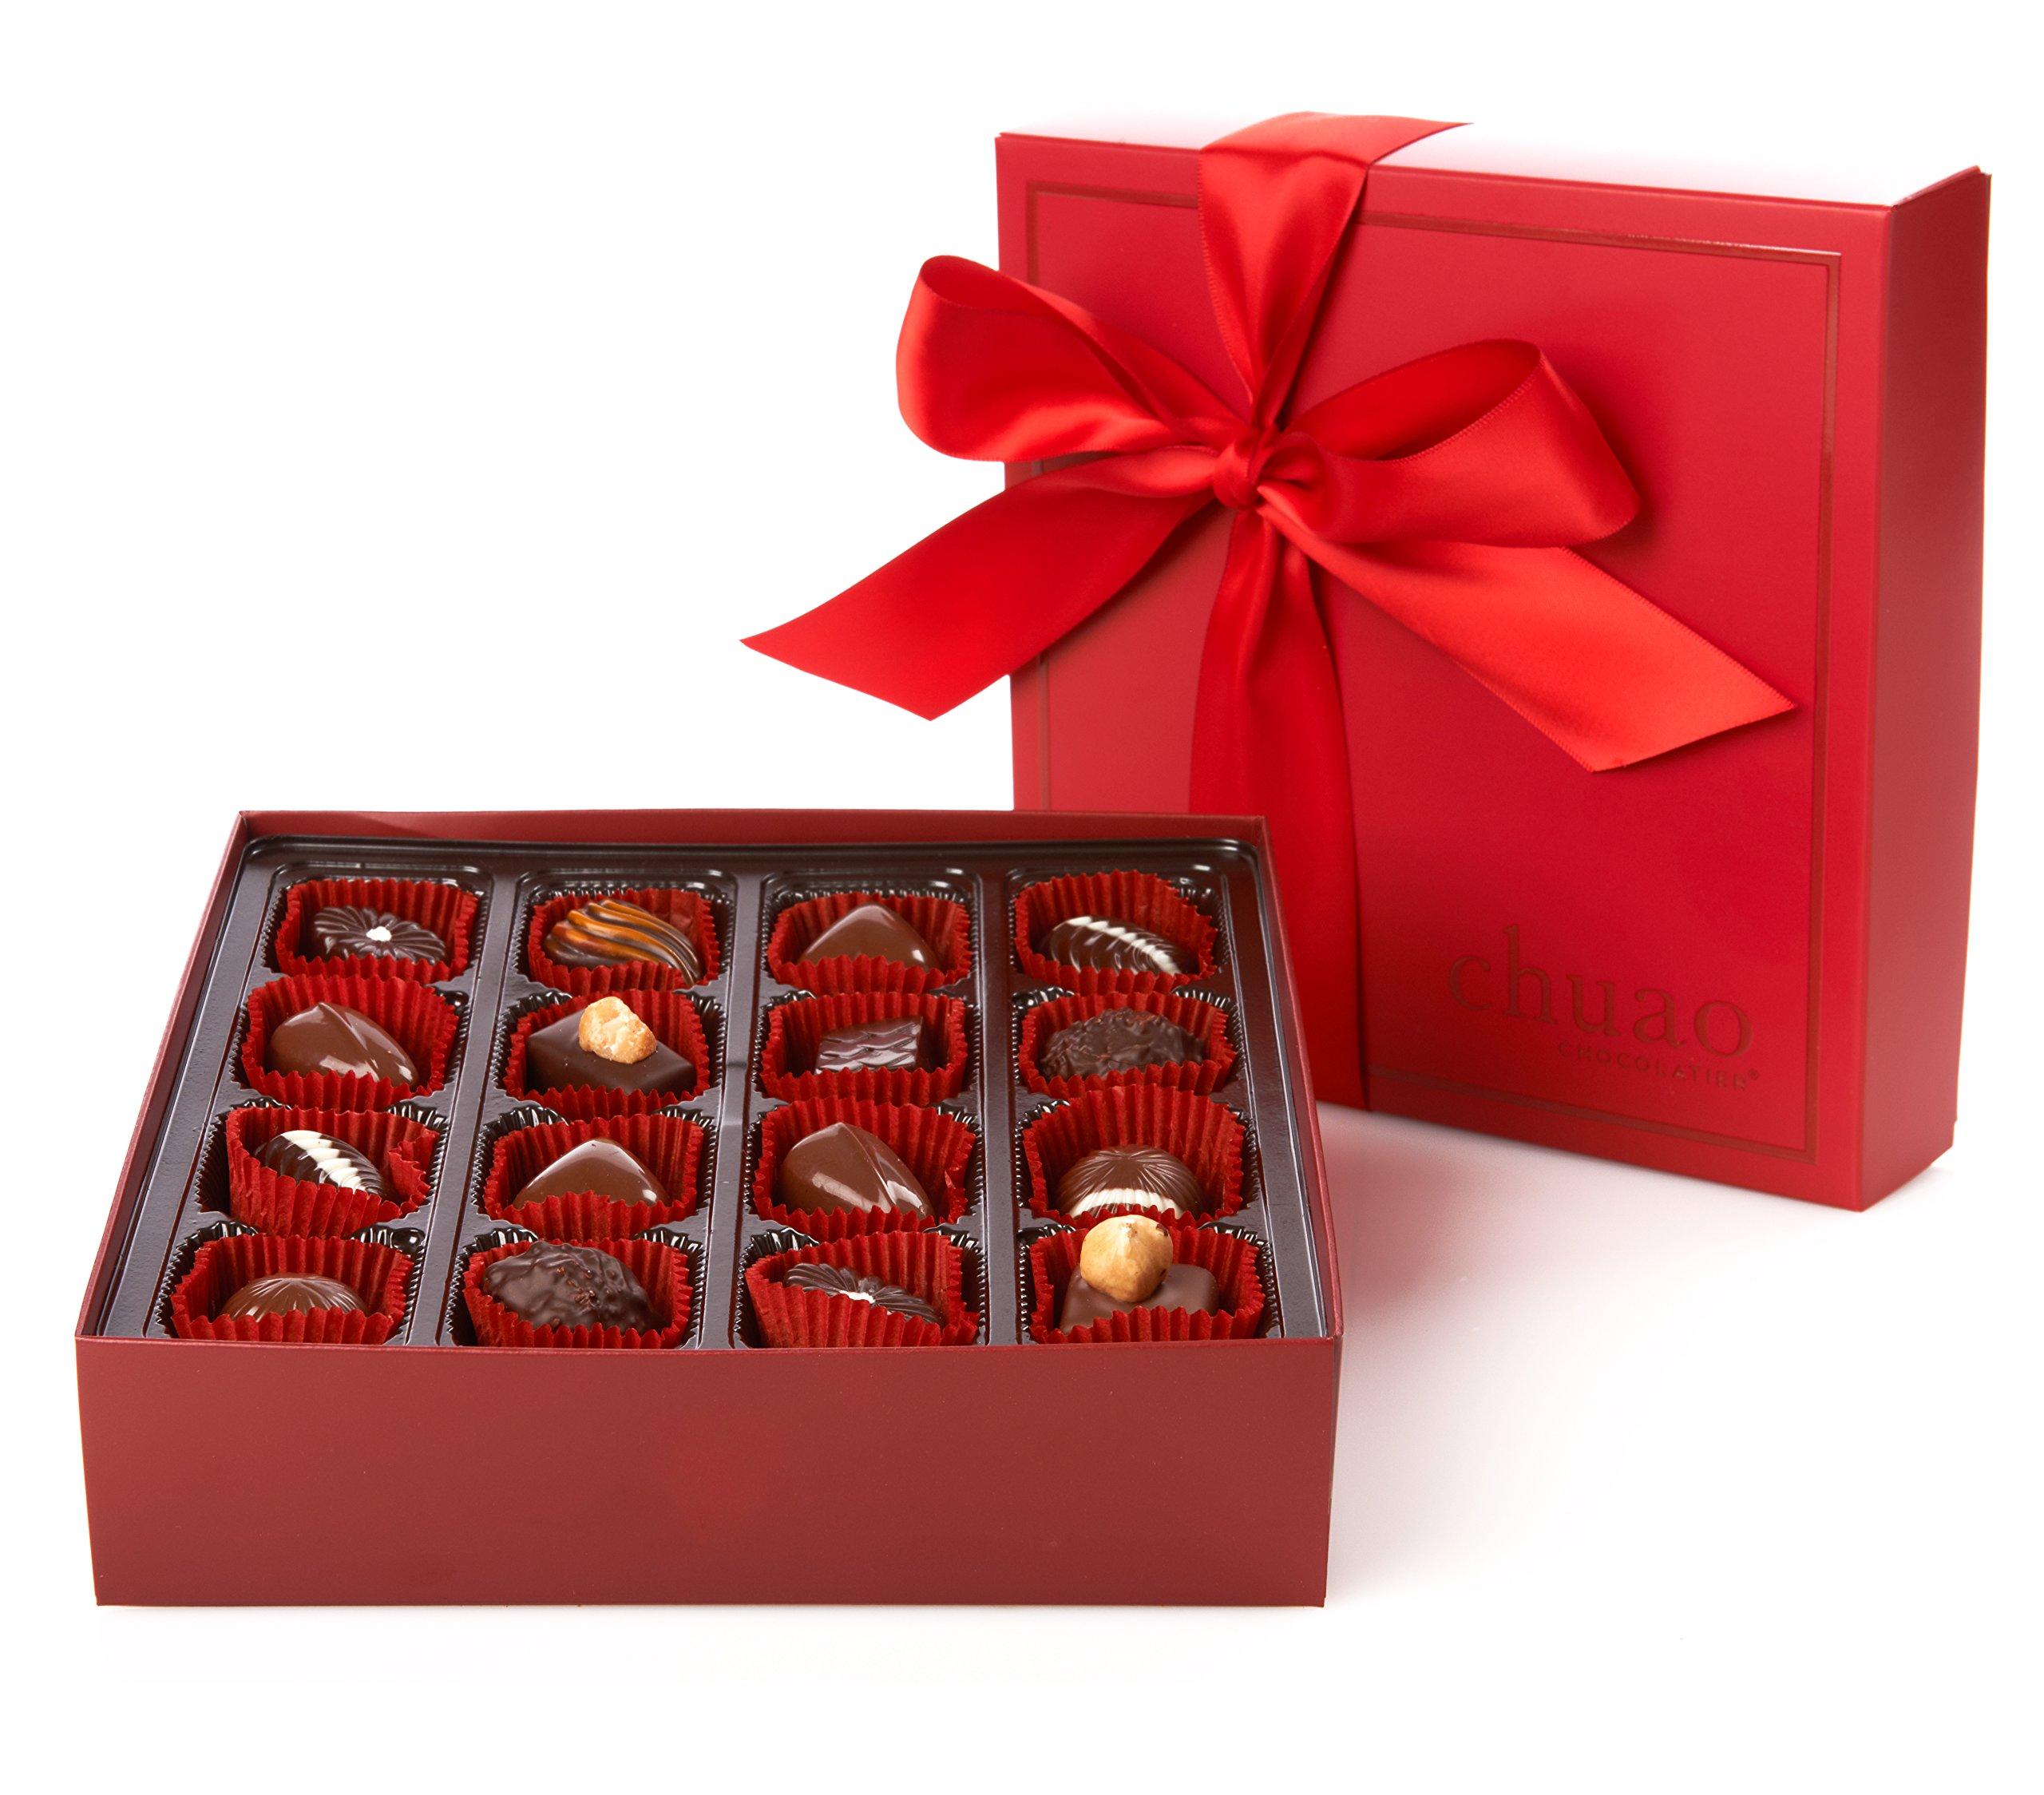 Bonbon Collection - Chuao Chocolatier Chef's Favorites Bonbon Collection Gift Set - Best-Selling Chocolate - Gourmet Artisan Milk & Dark Chocolate - Free of Artificial Flavors (16 Piece)